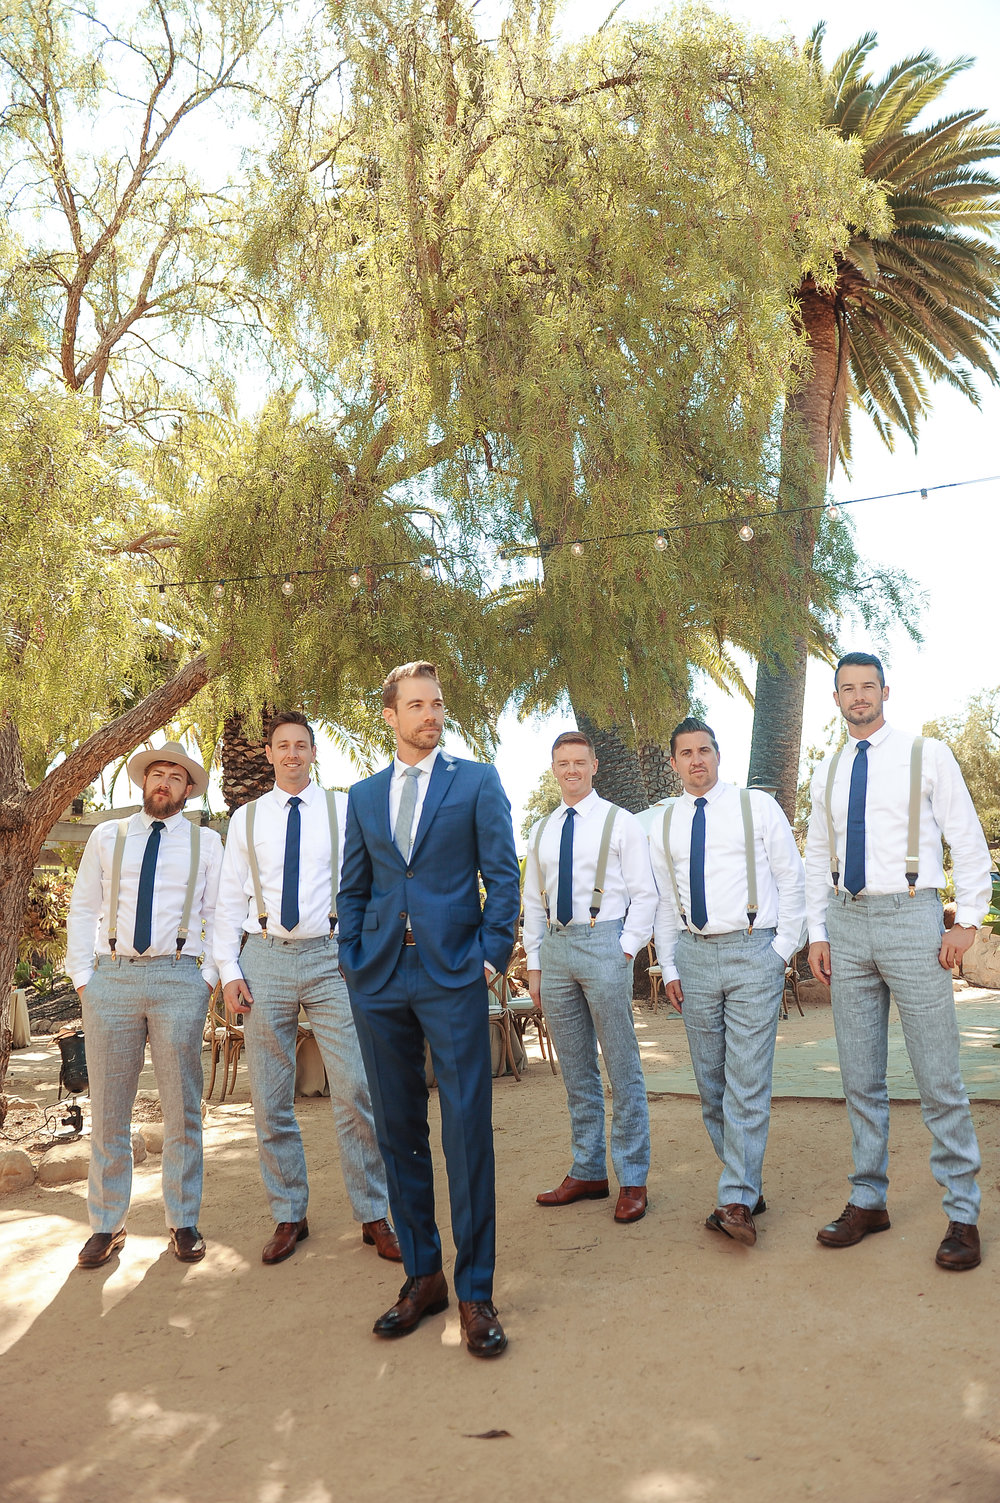 www.santabarbarawedding.com | JKoe Photography | Santa Barbara Historical Museum | Groomsmen